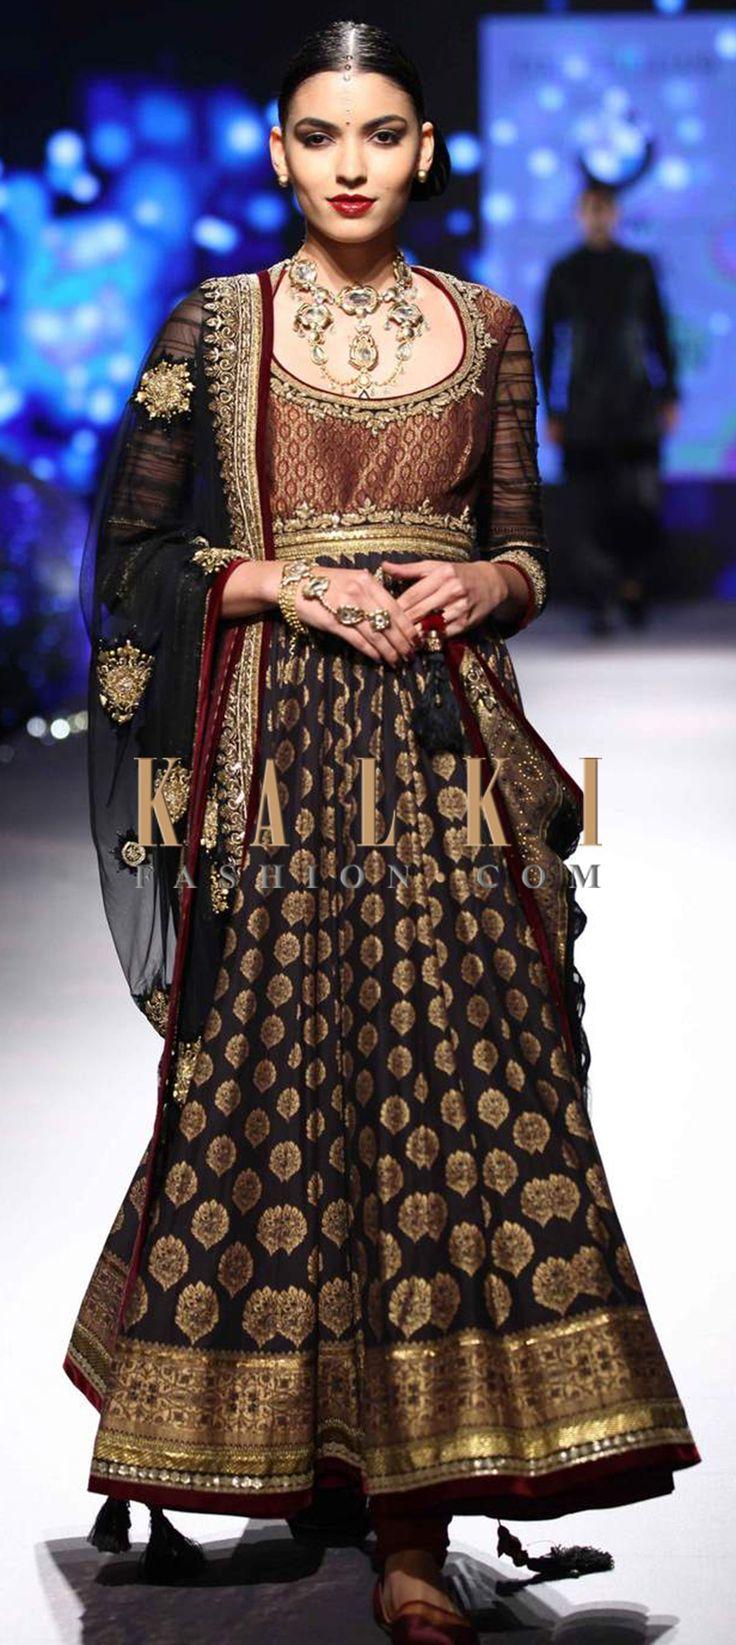 Click on the following link - http://www.kalkifashion.com/designers/tarun-tahiliani.html